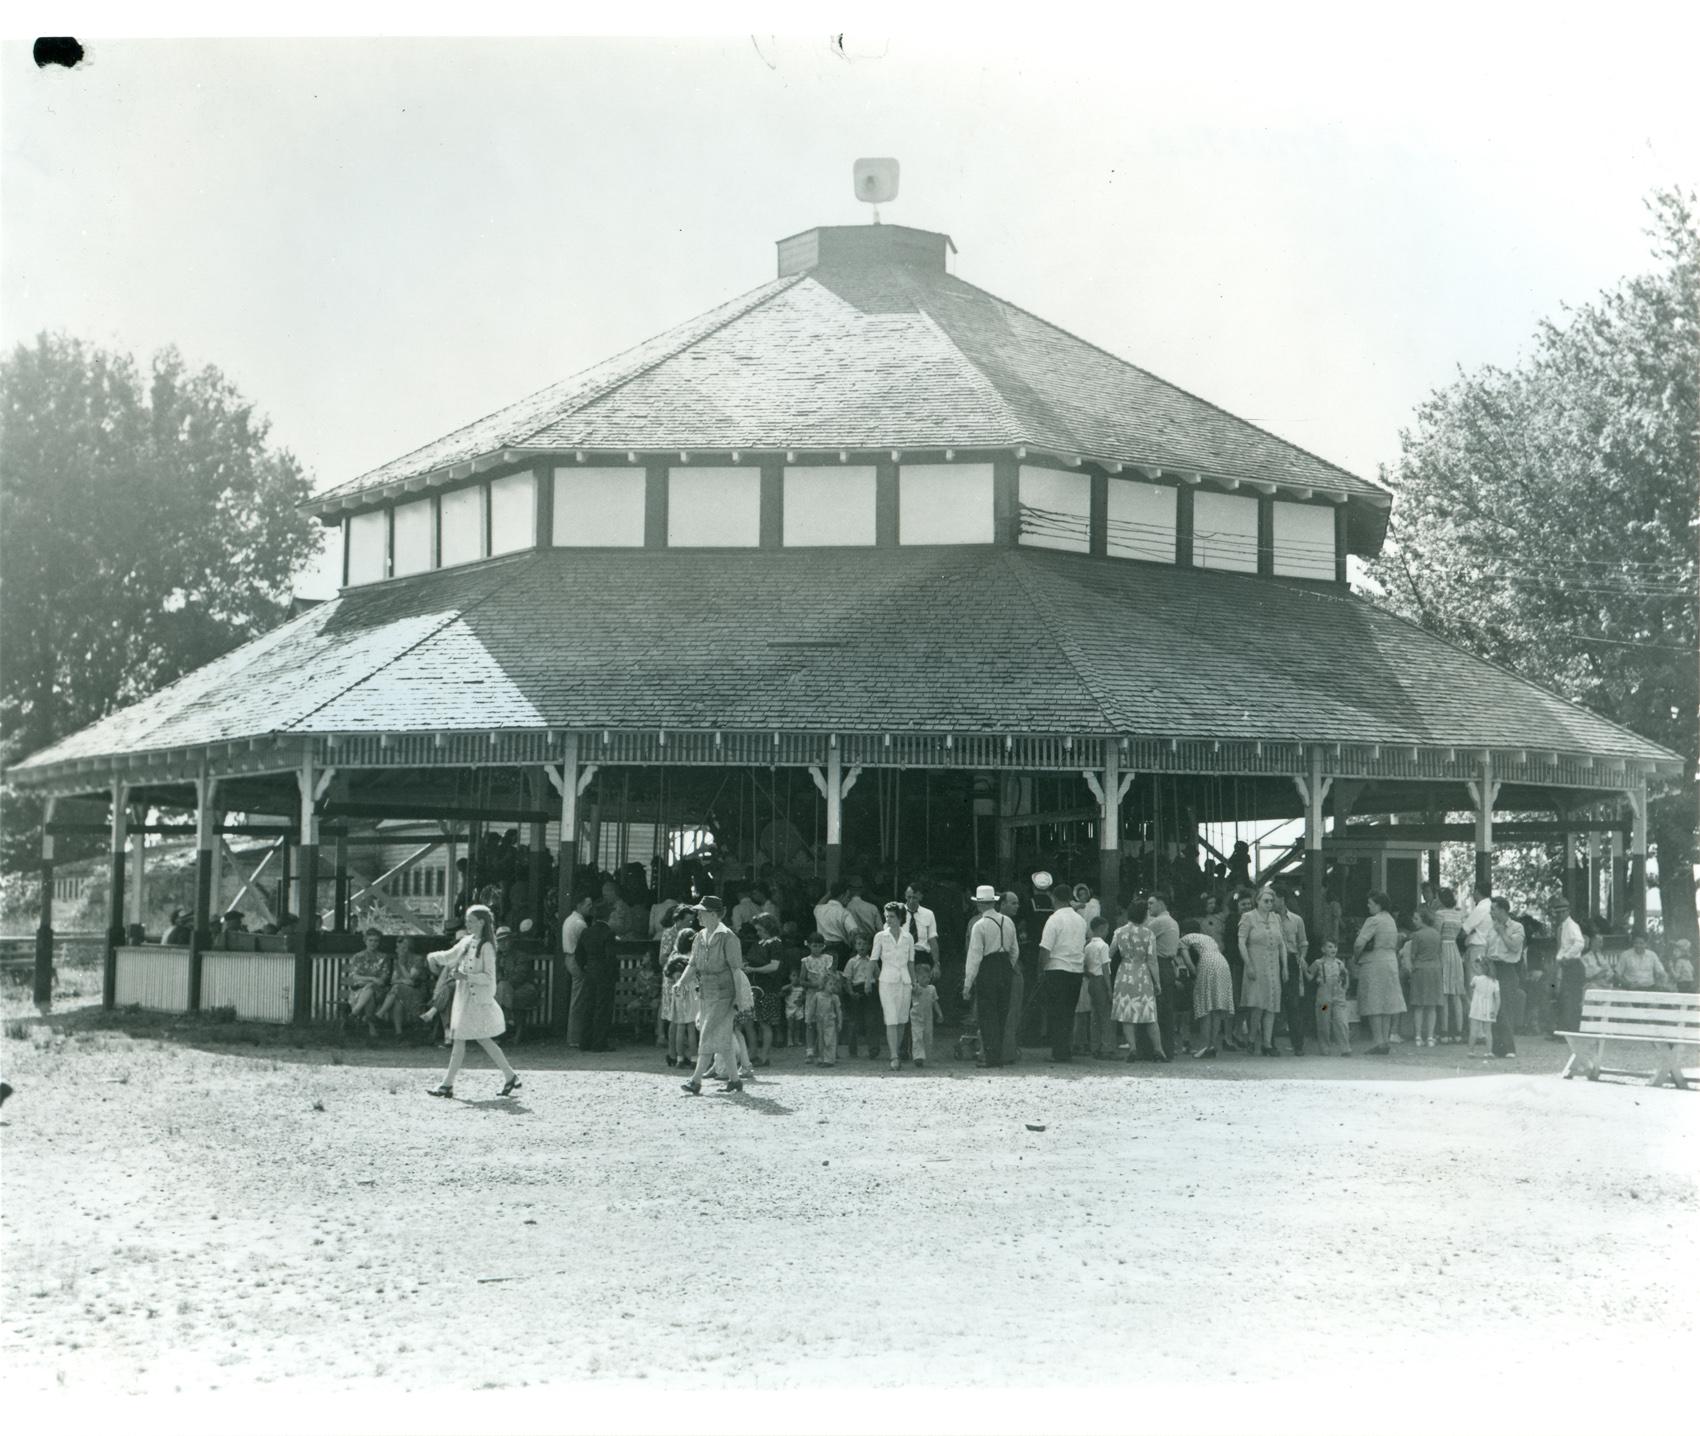 Illions-Supreme-Celeron-Park-NY-ca-1949